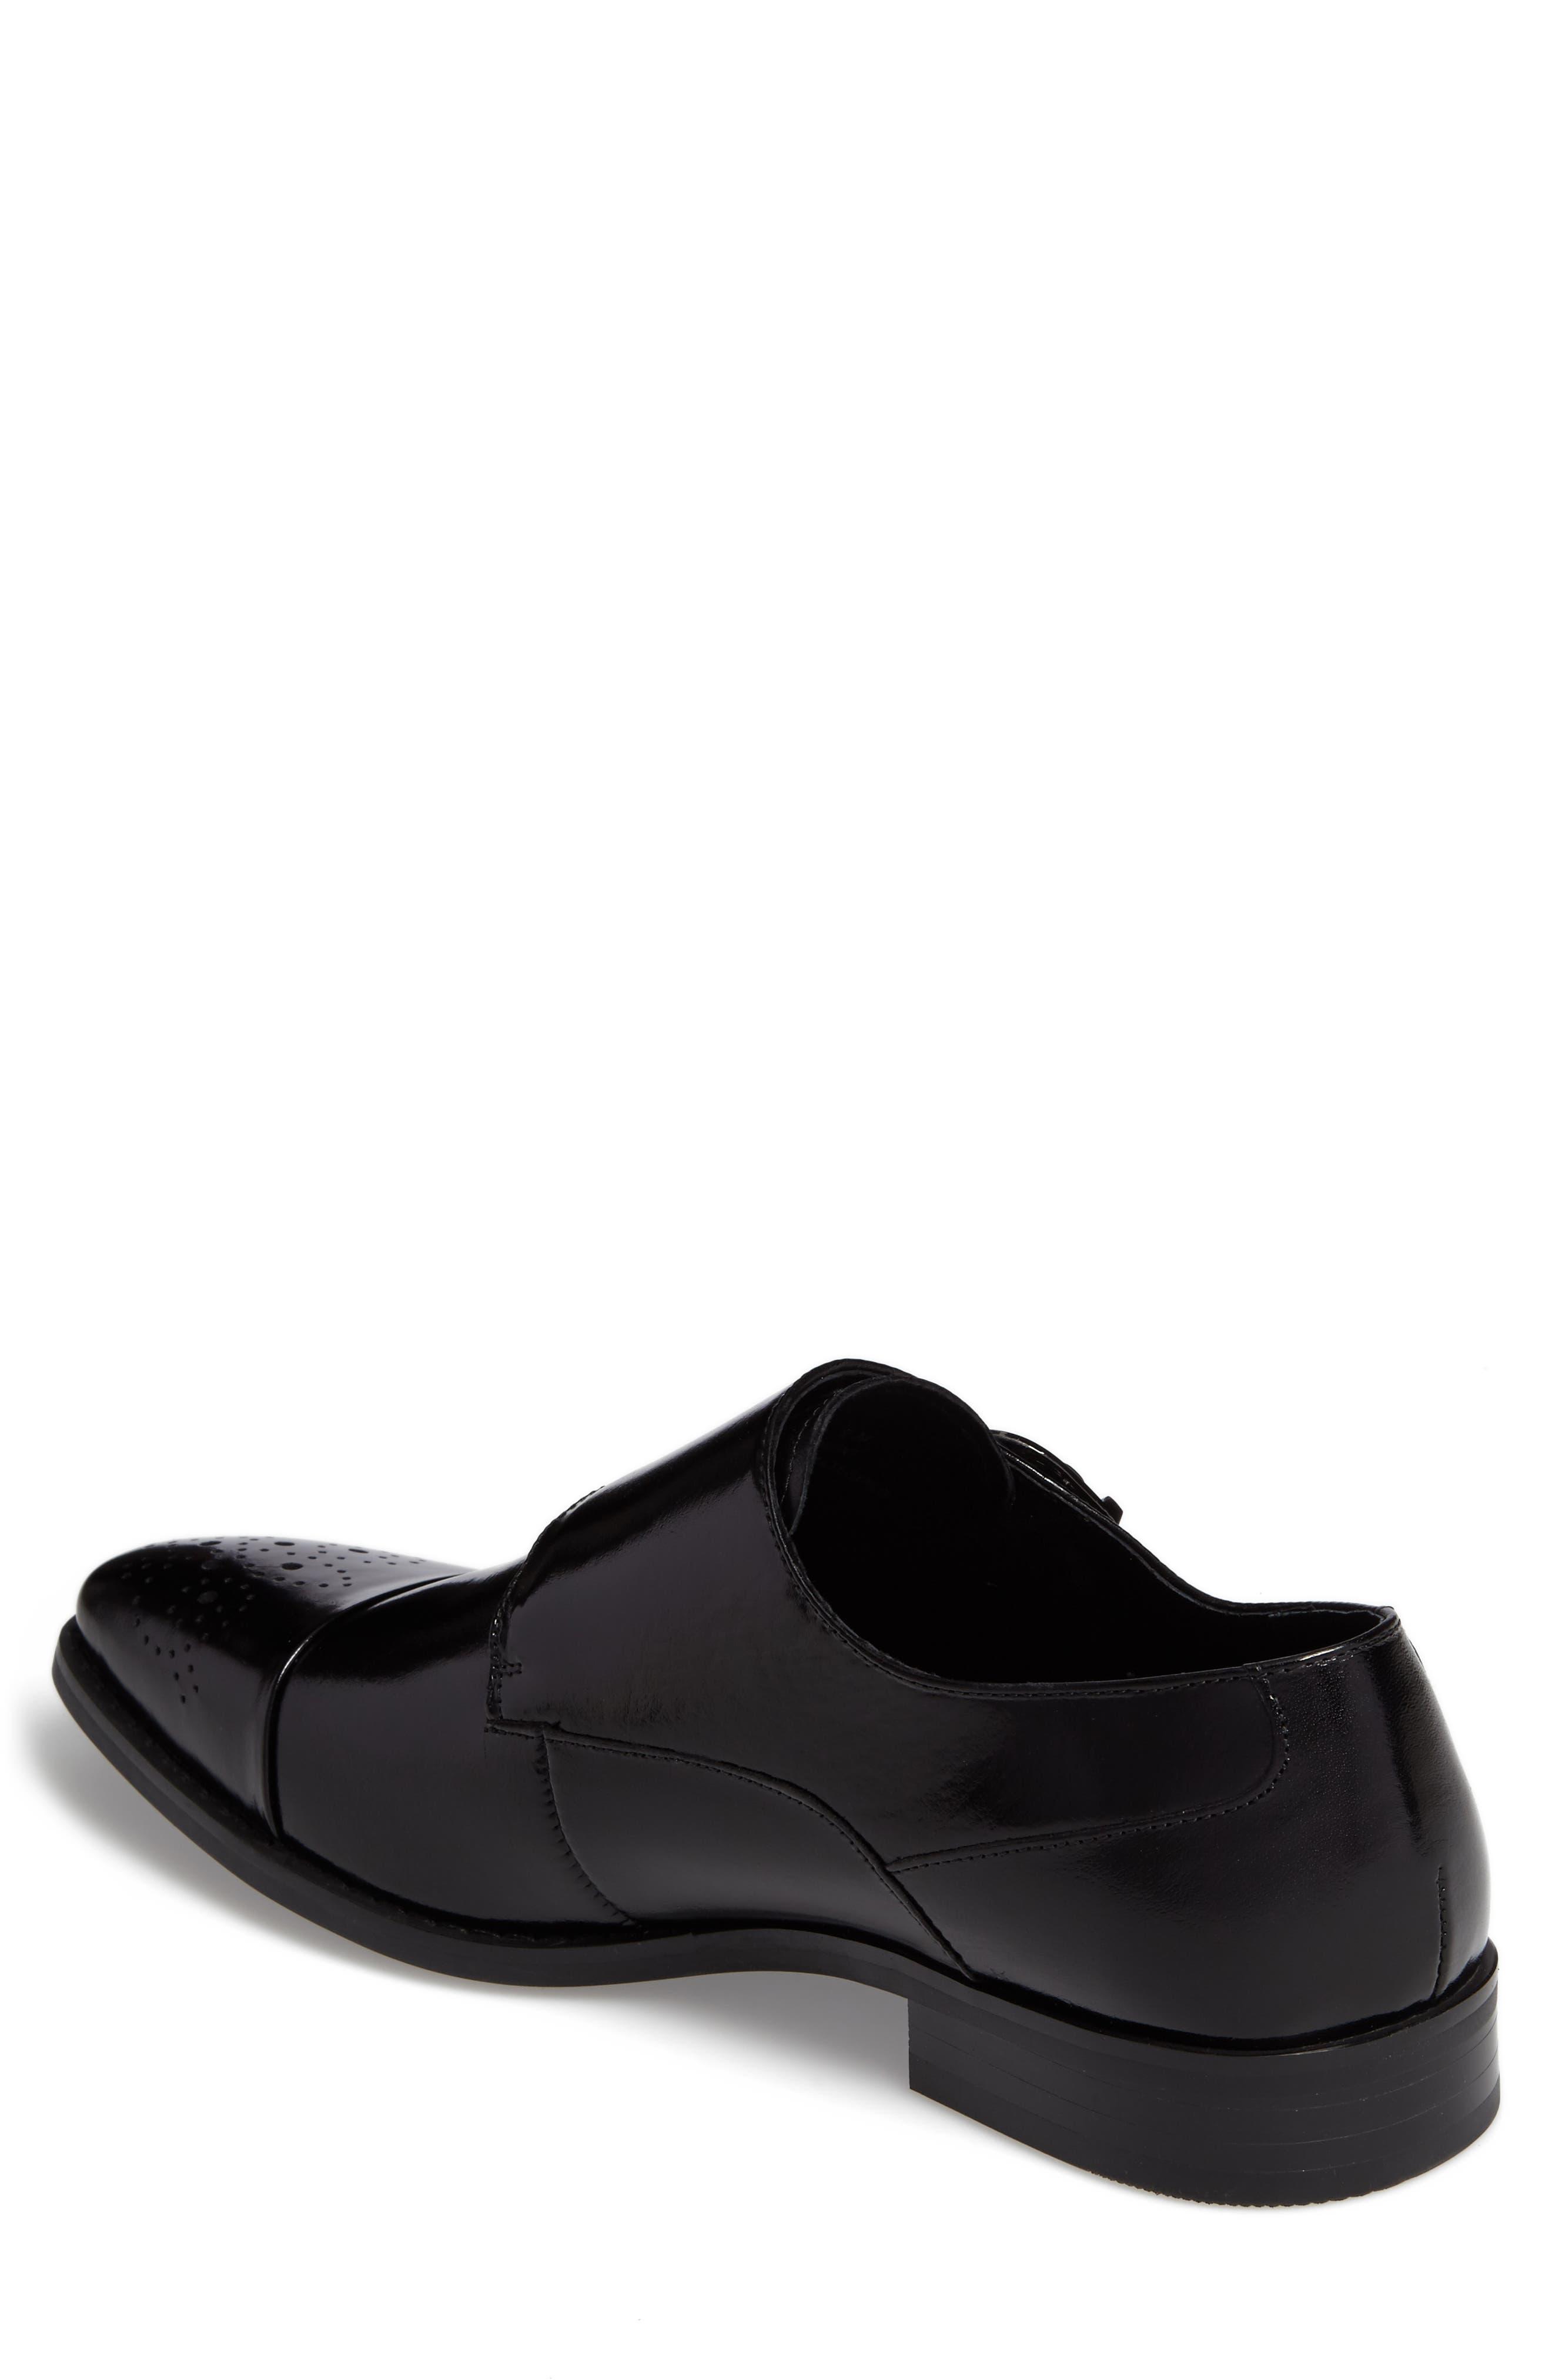 Alternate Image 2  - Stacy Adams Trevor Double Monk Strap Shoe (Men)